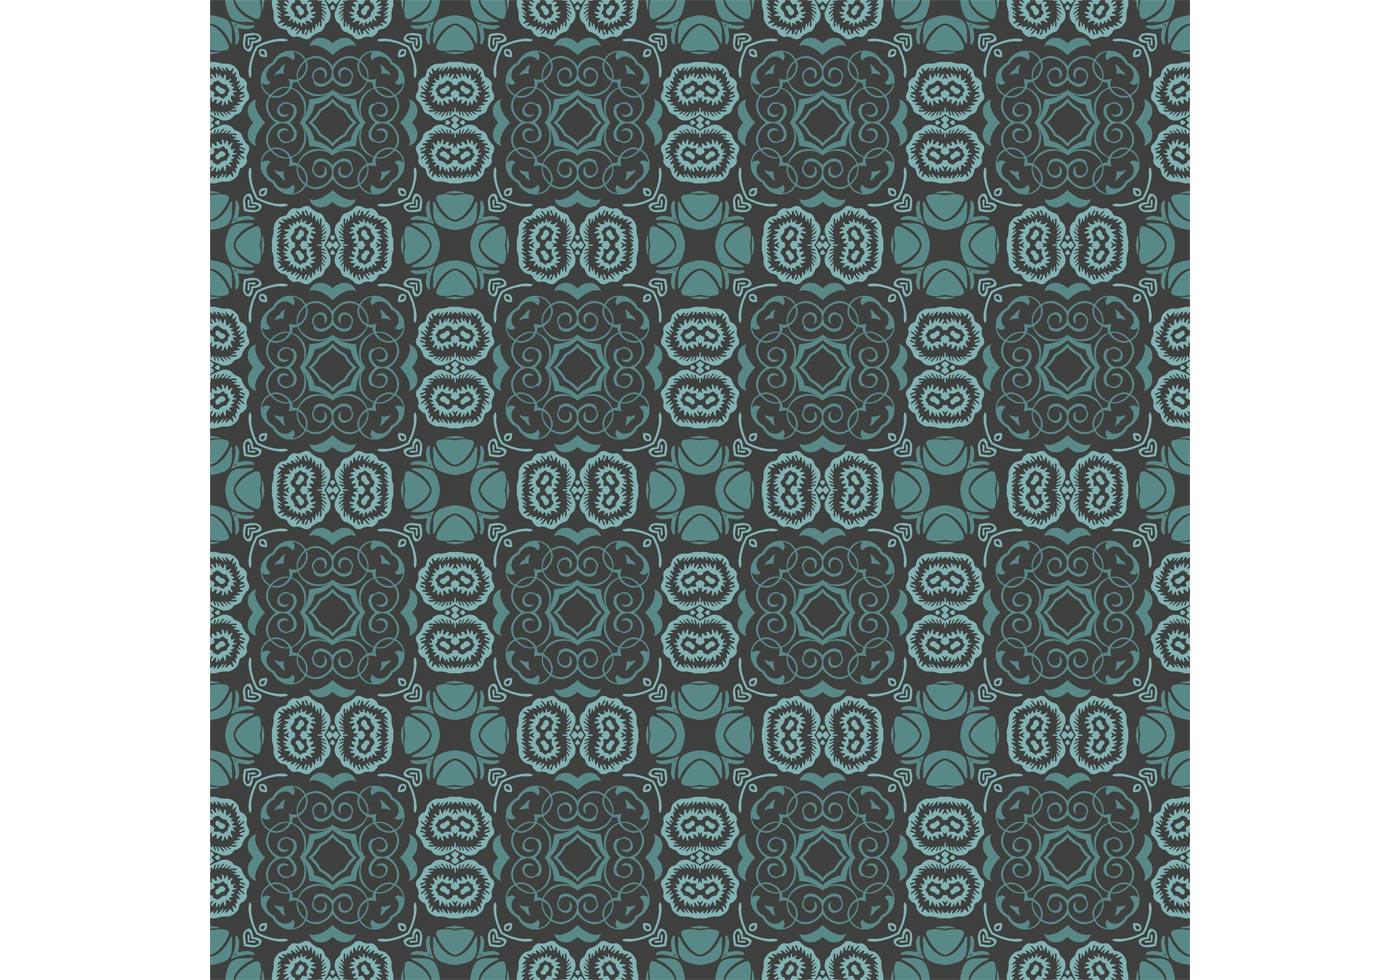 Free Decorative Wallpaper Pattern Download Free Vector Art Stock